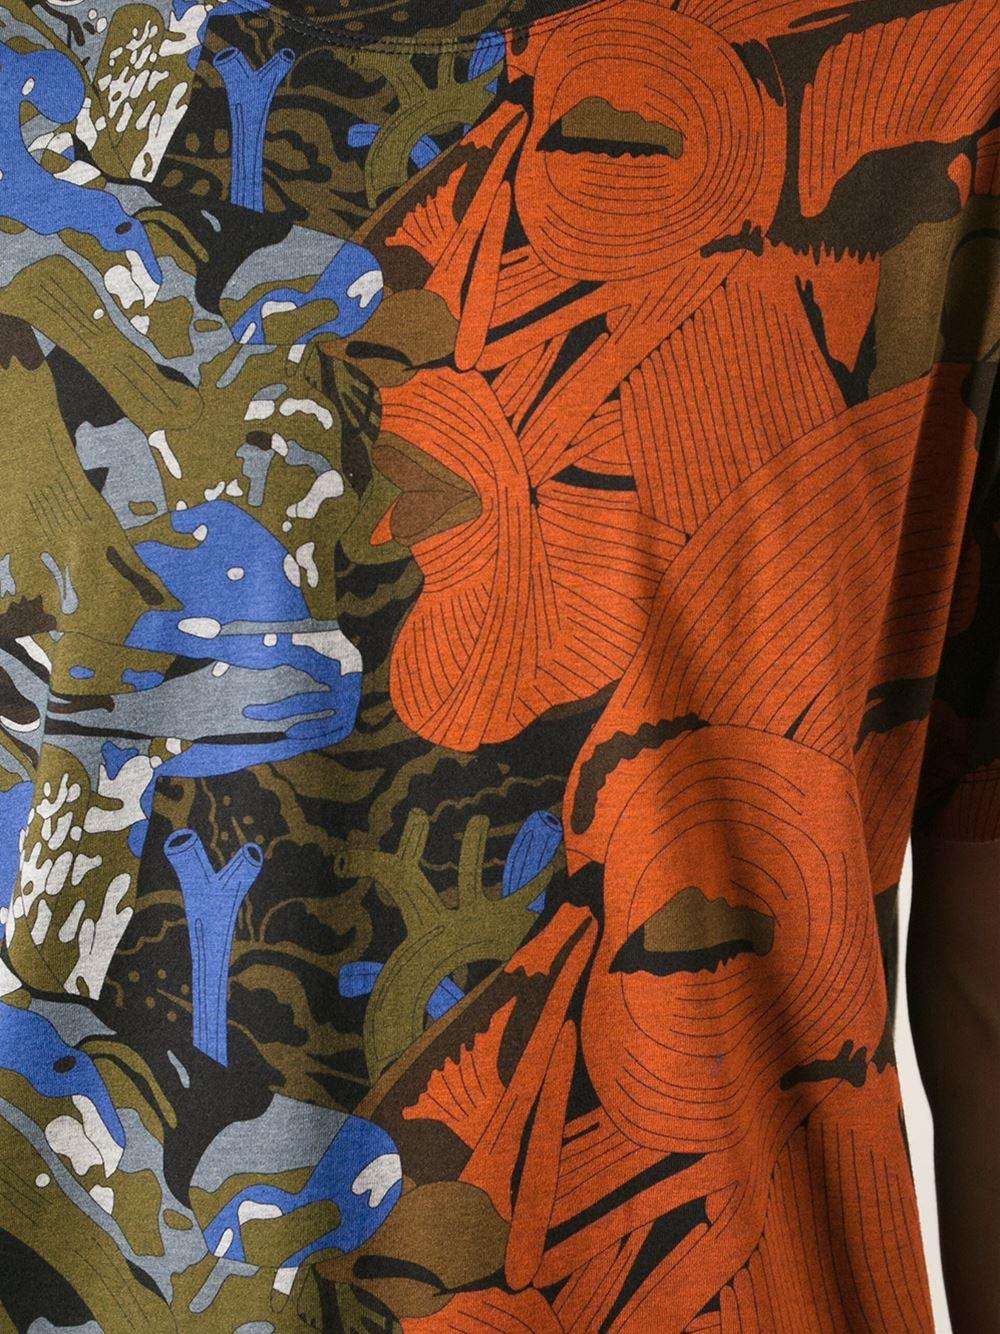 lyst moncler gamme rouge abstract floral print t shirt for men. Black Bedroom Furniture Sets. Home Design Ideas